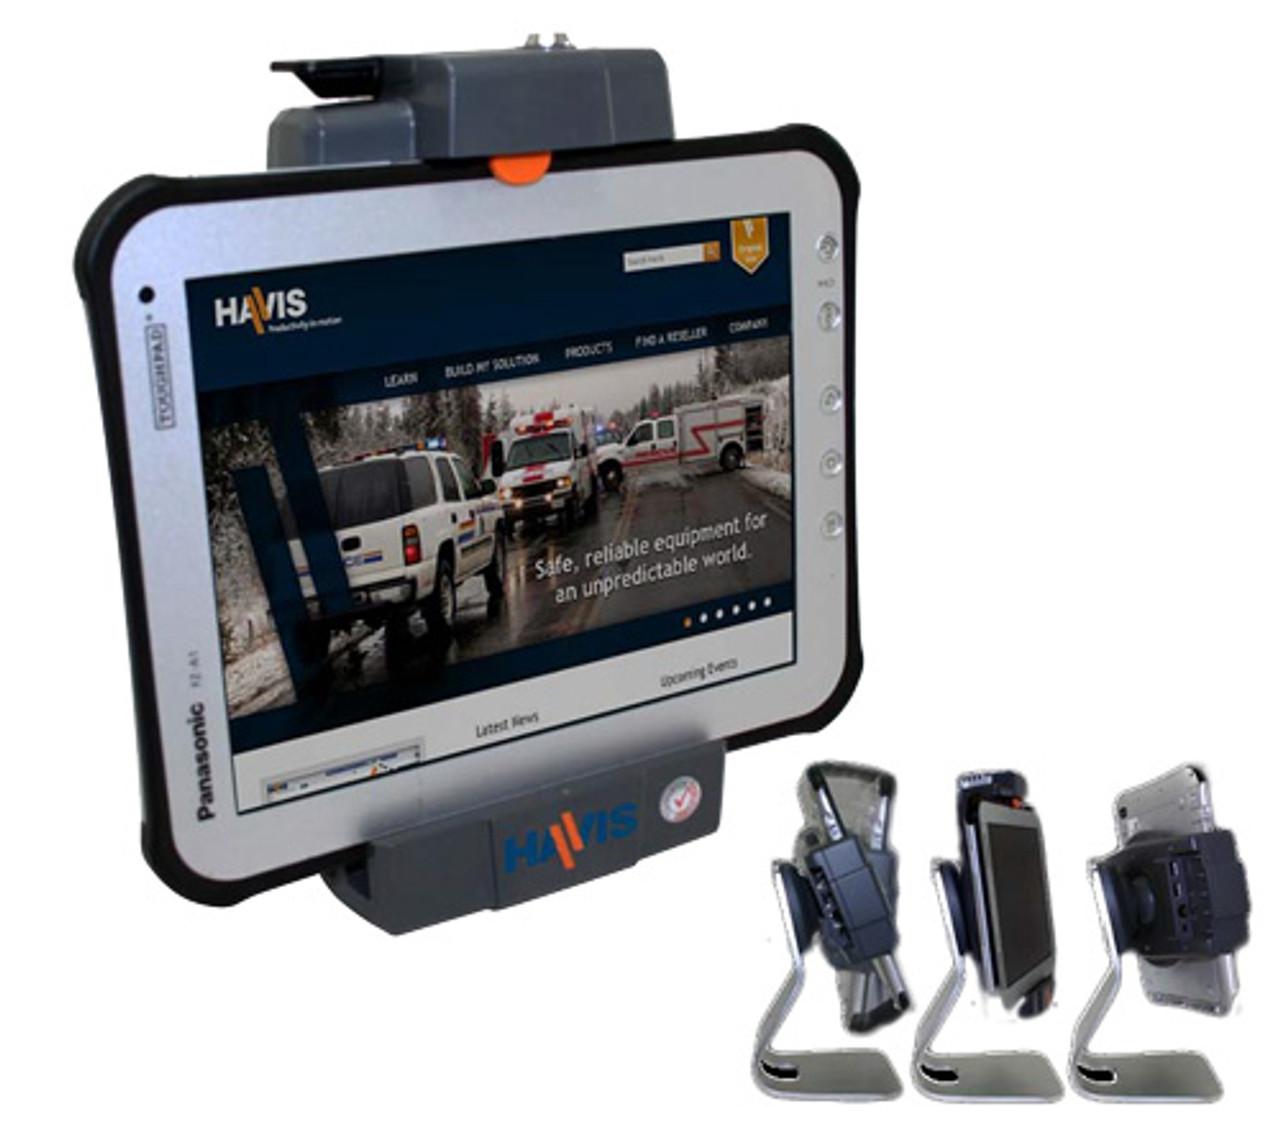 Panasonic Toughpad FZ-A1 tablets Docking Station by Havis